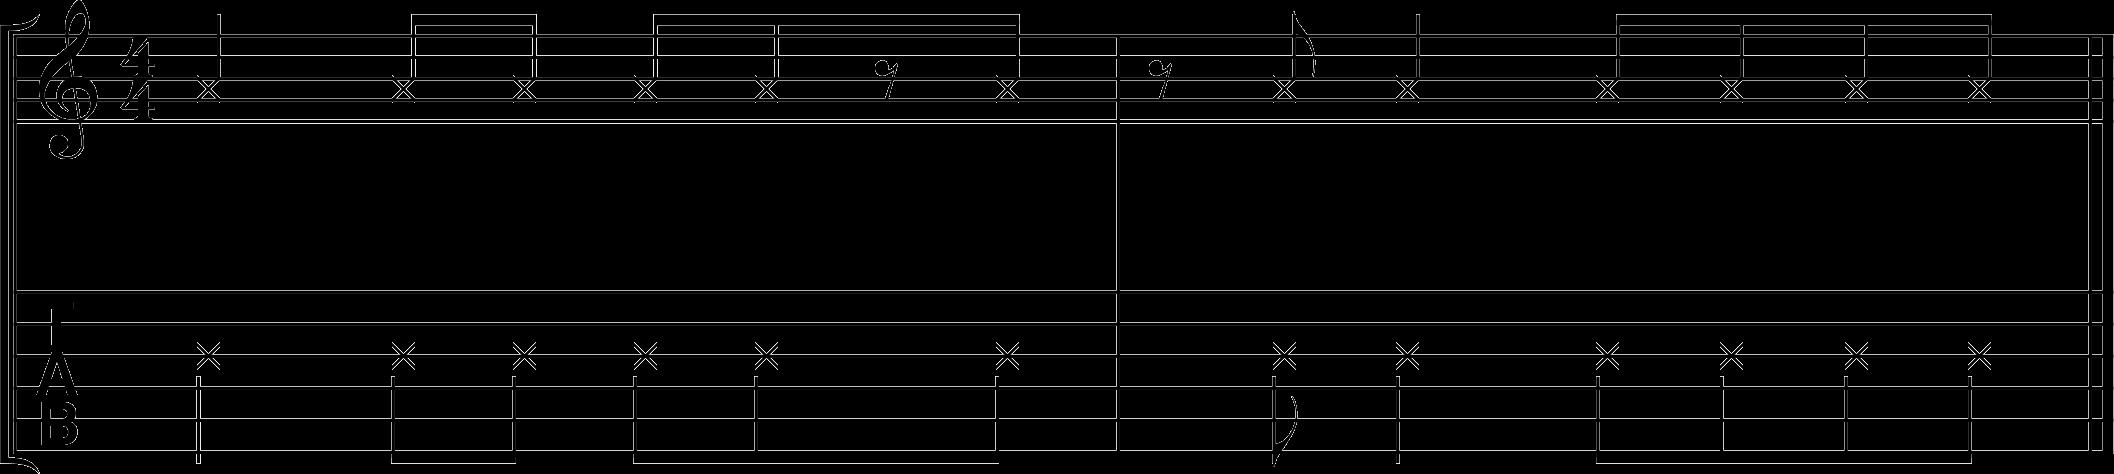 Guitar String Scratching Exercises Hub Guitar